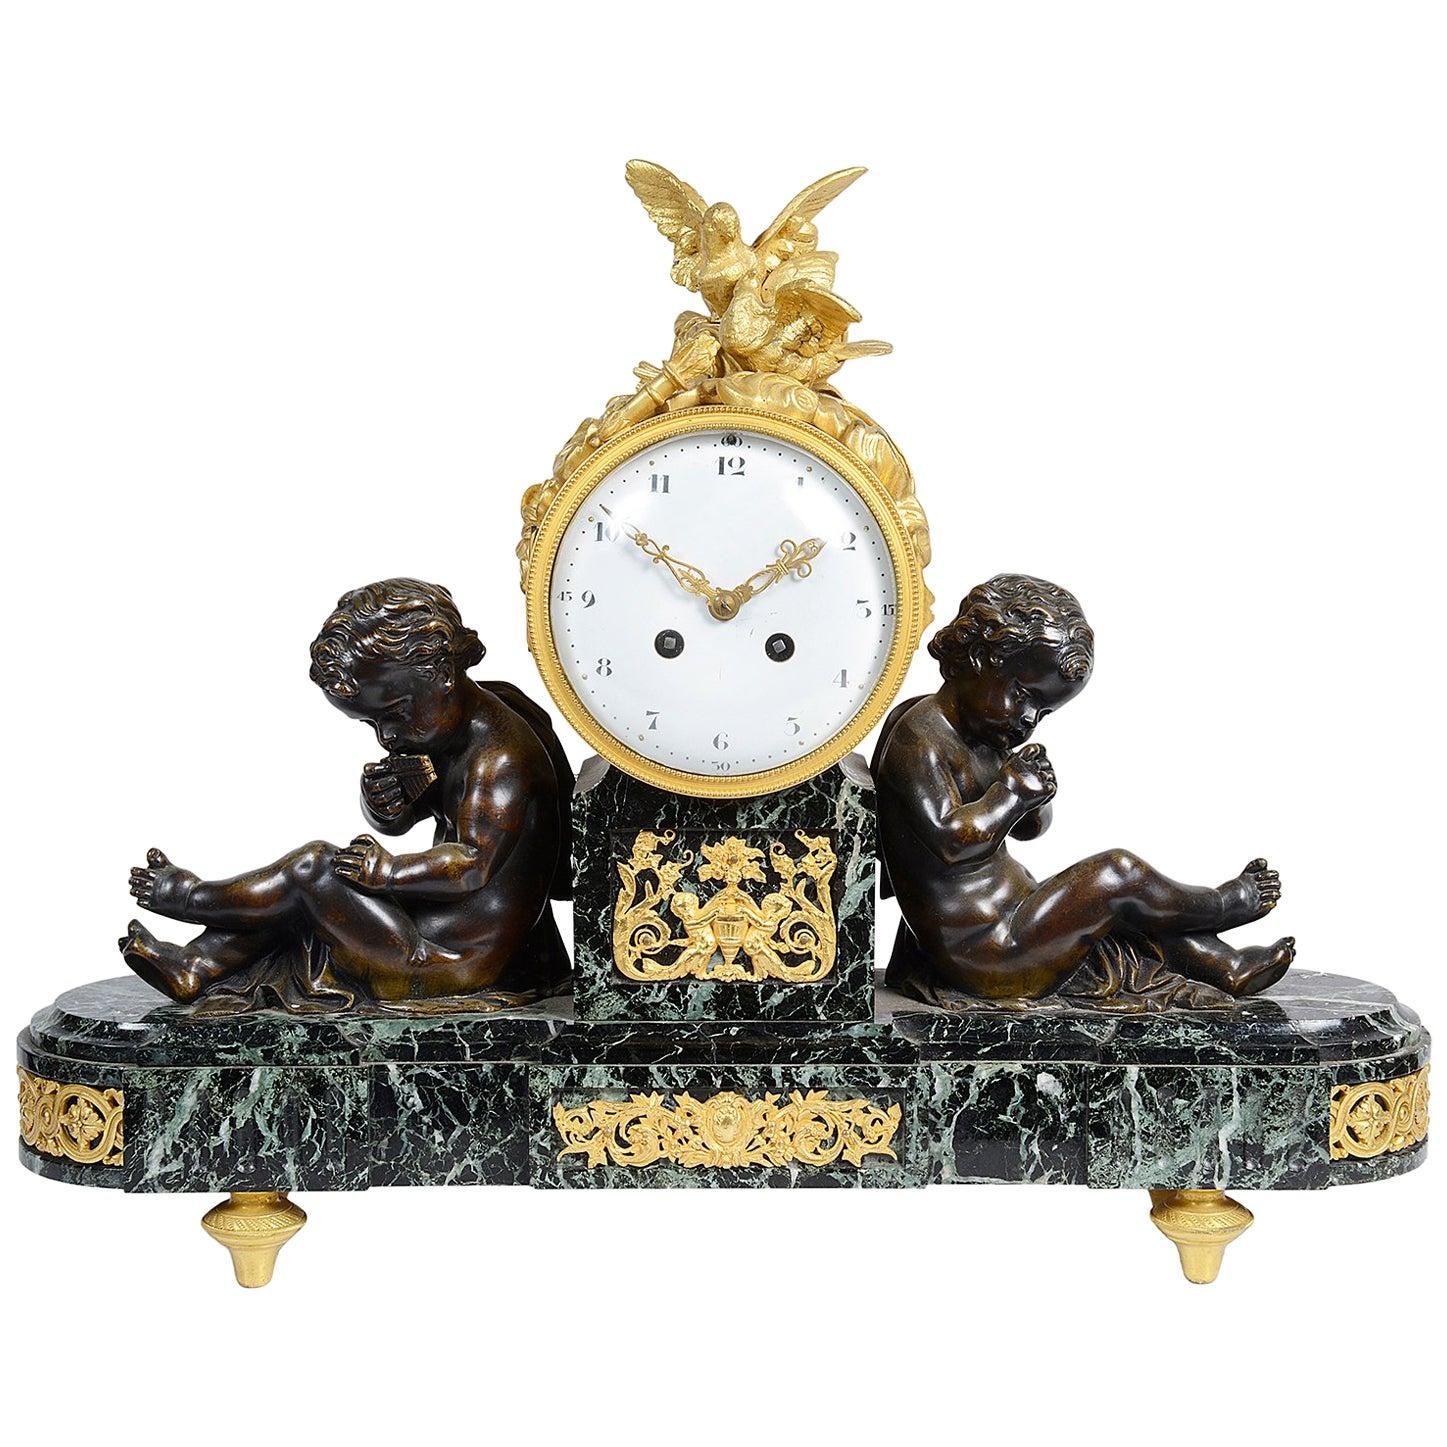 Louis XVI Style Marble and Ormolu Mantel Clock, 19th Century